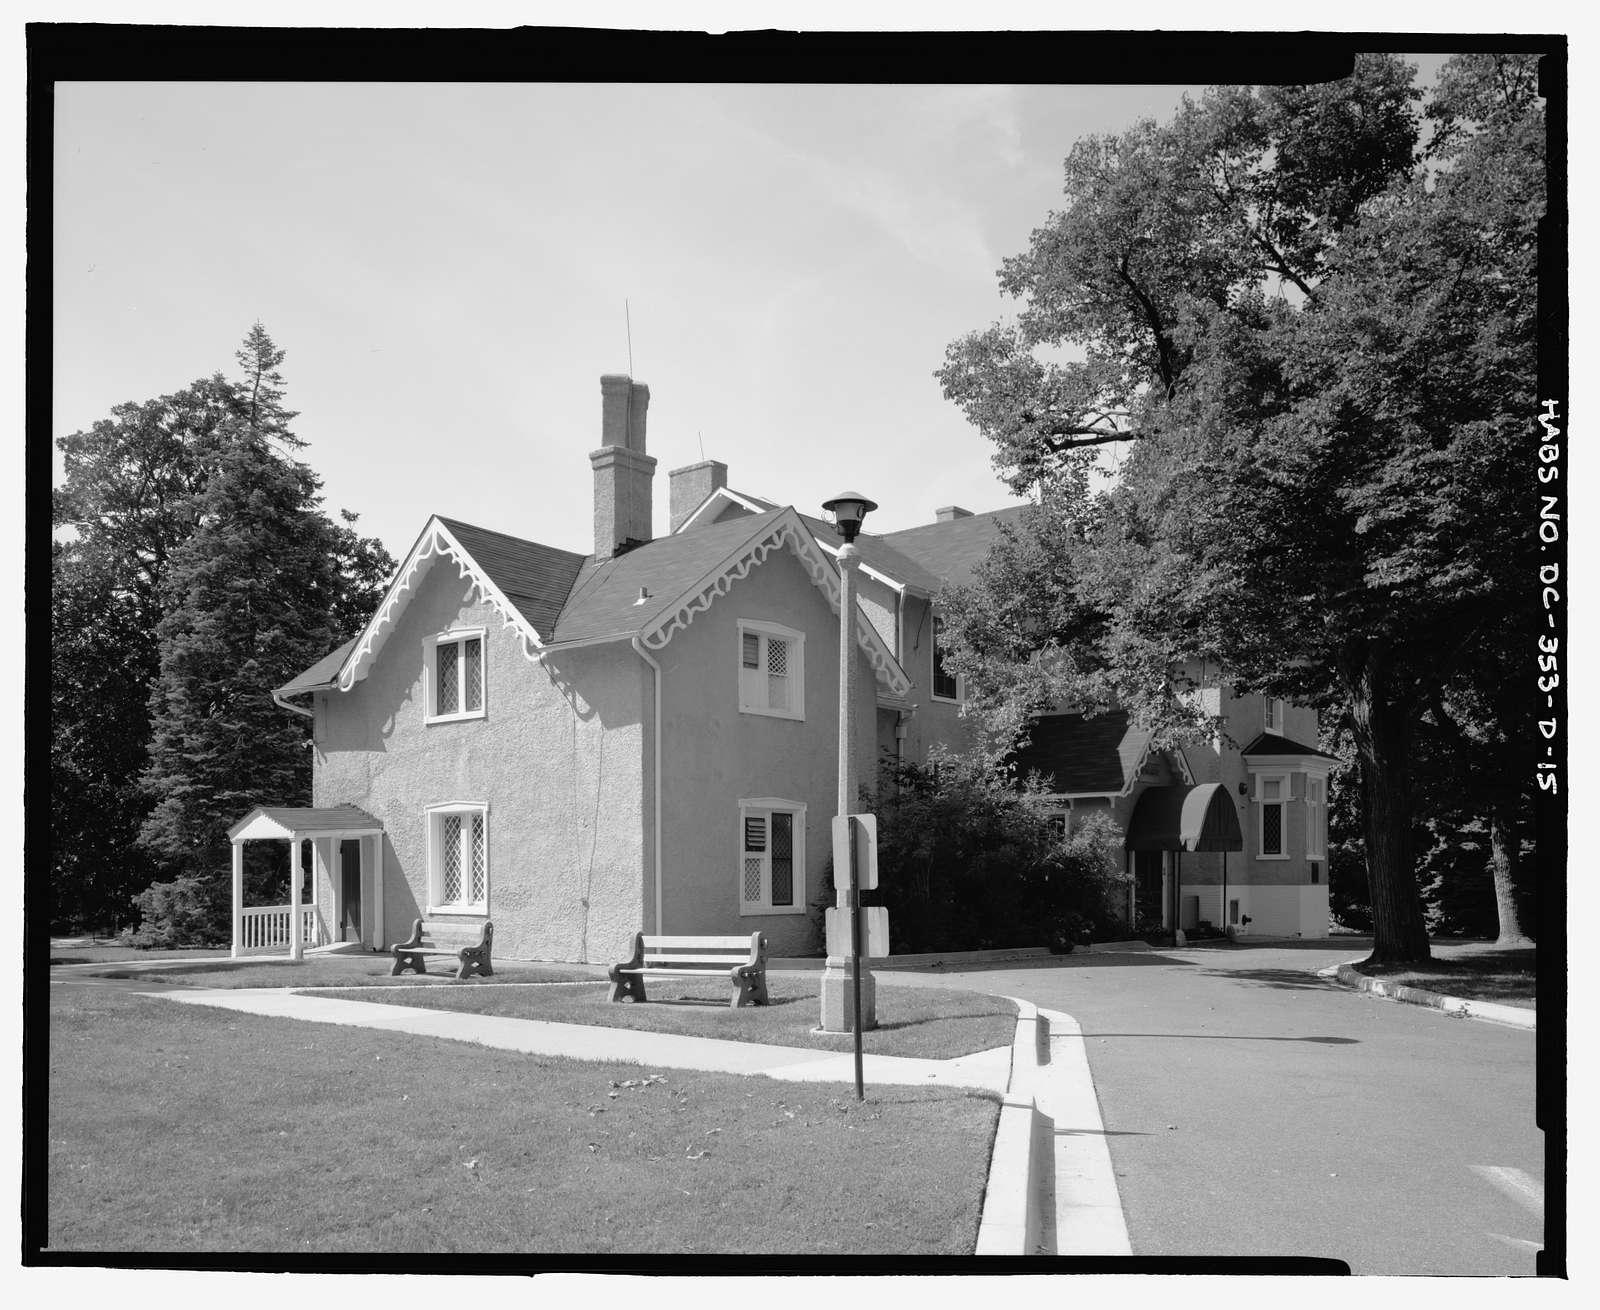 U.S. Soldiers Home, Corn Rigs, Rock Creek Church Road & Upshur Street Northwest, Washington, District of Columbia, DC